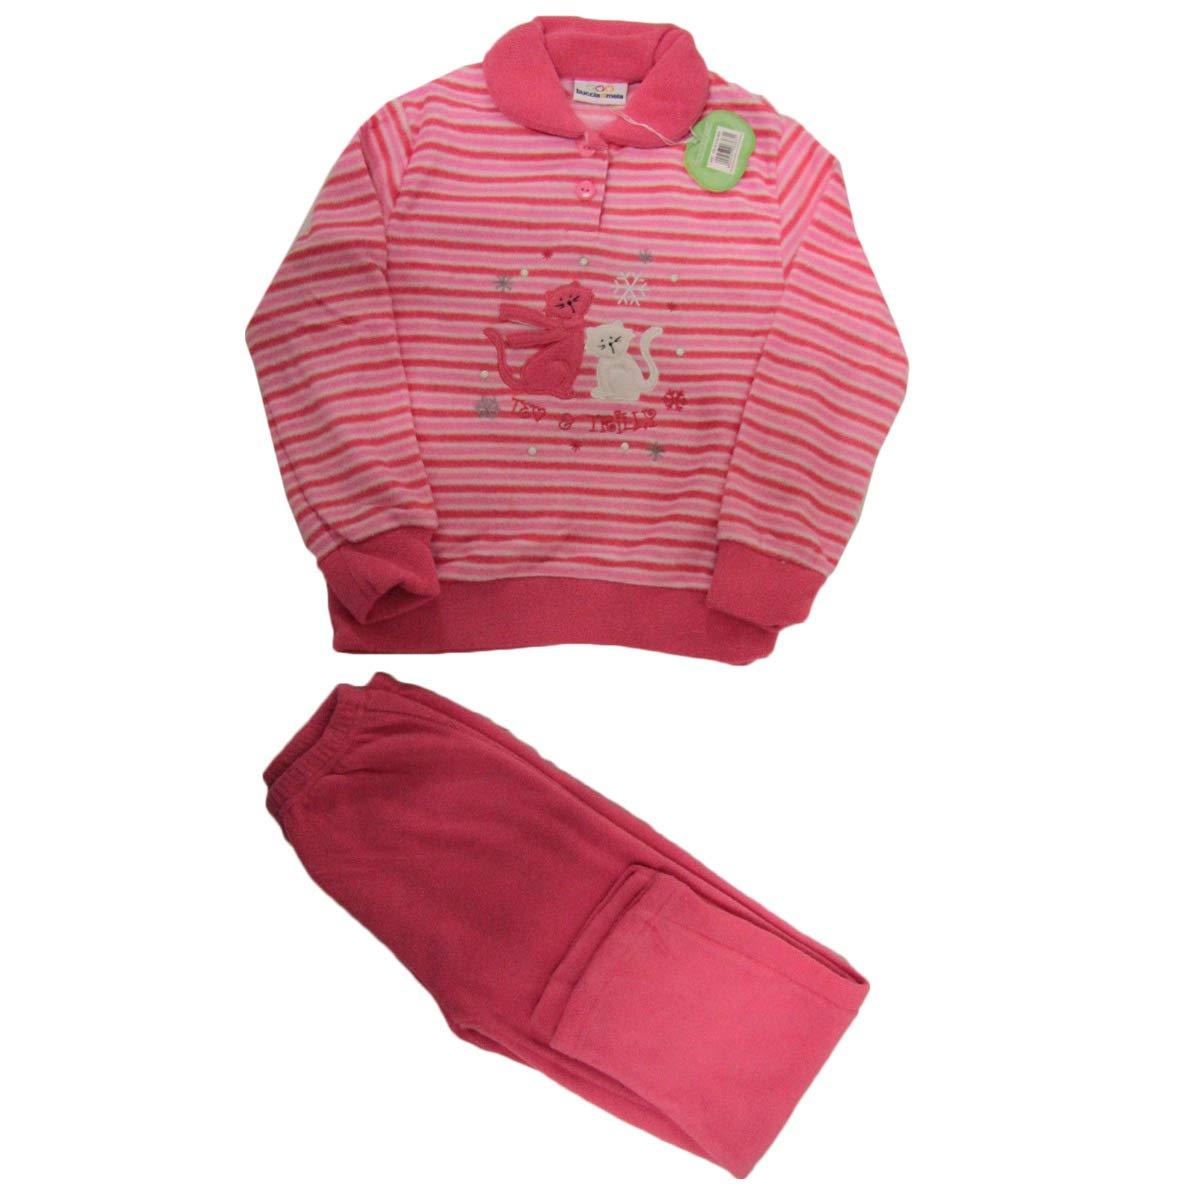 Russo Tessuti Pigiama Bimba Baby Bambina Buccia di Mela Pile Vari Colori Gattino -Blu-3/4 Anni